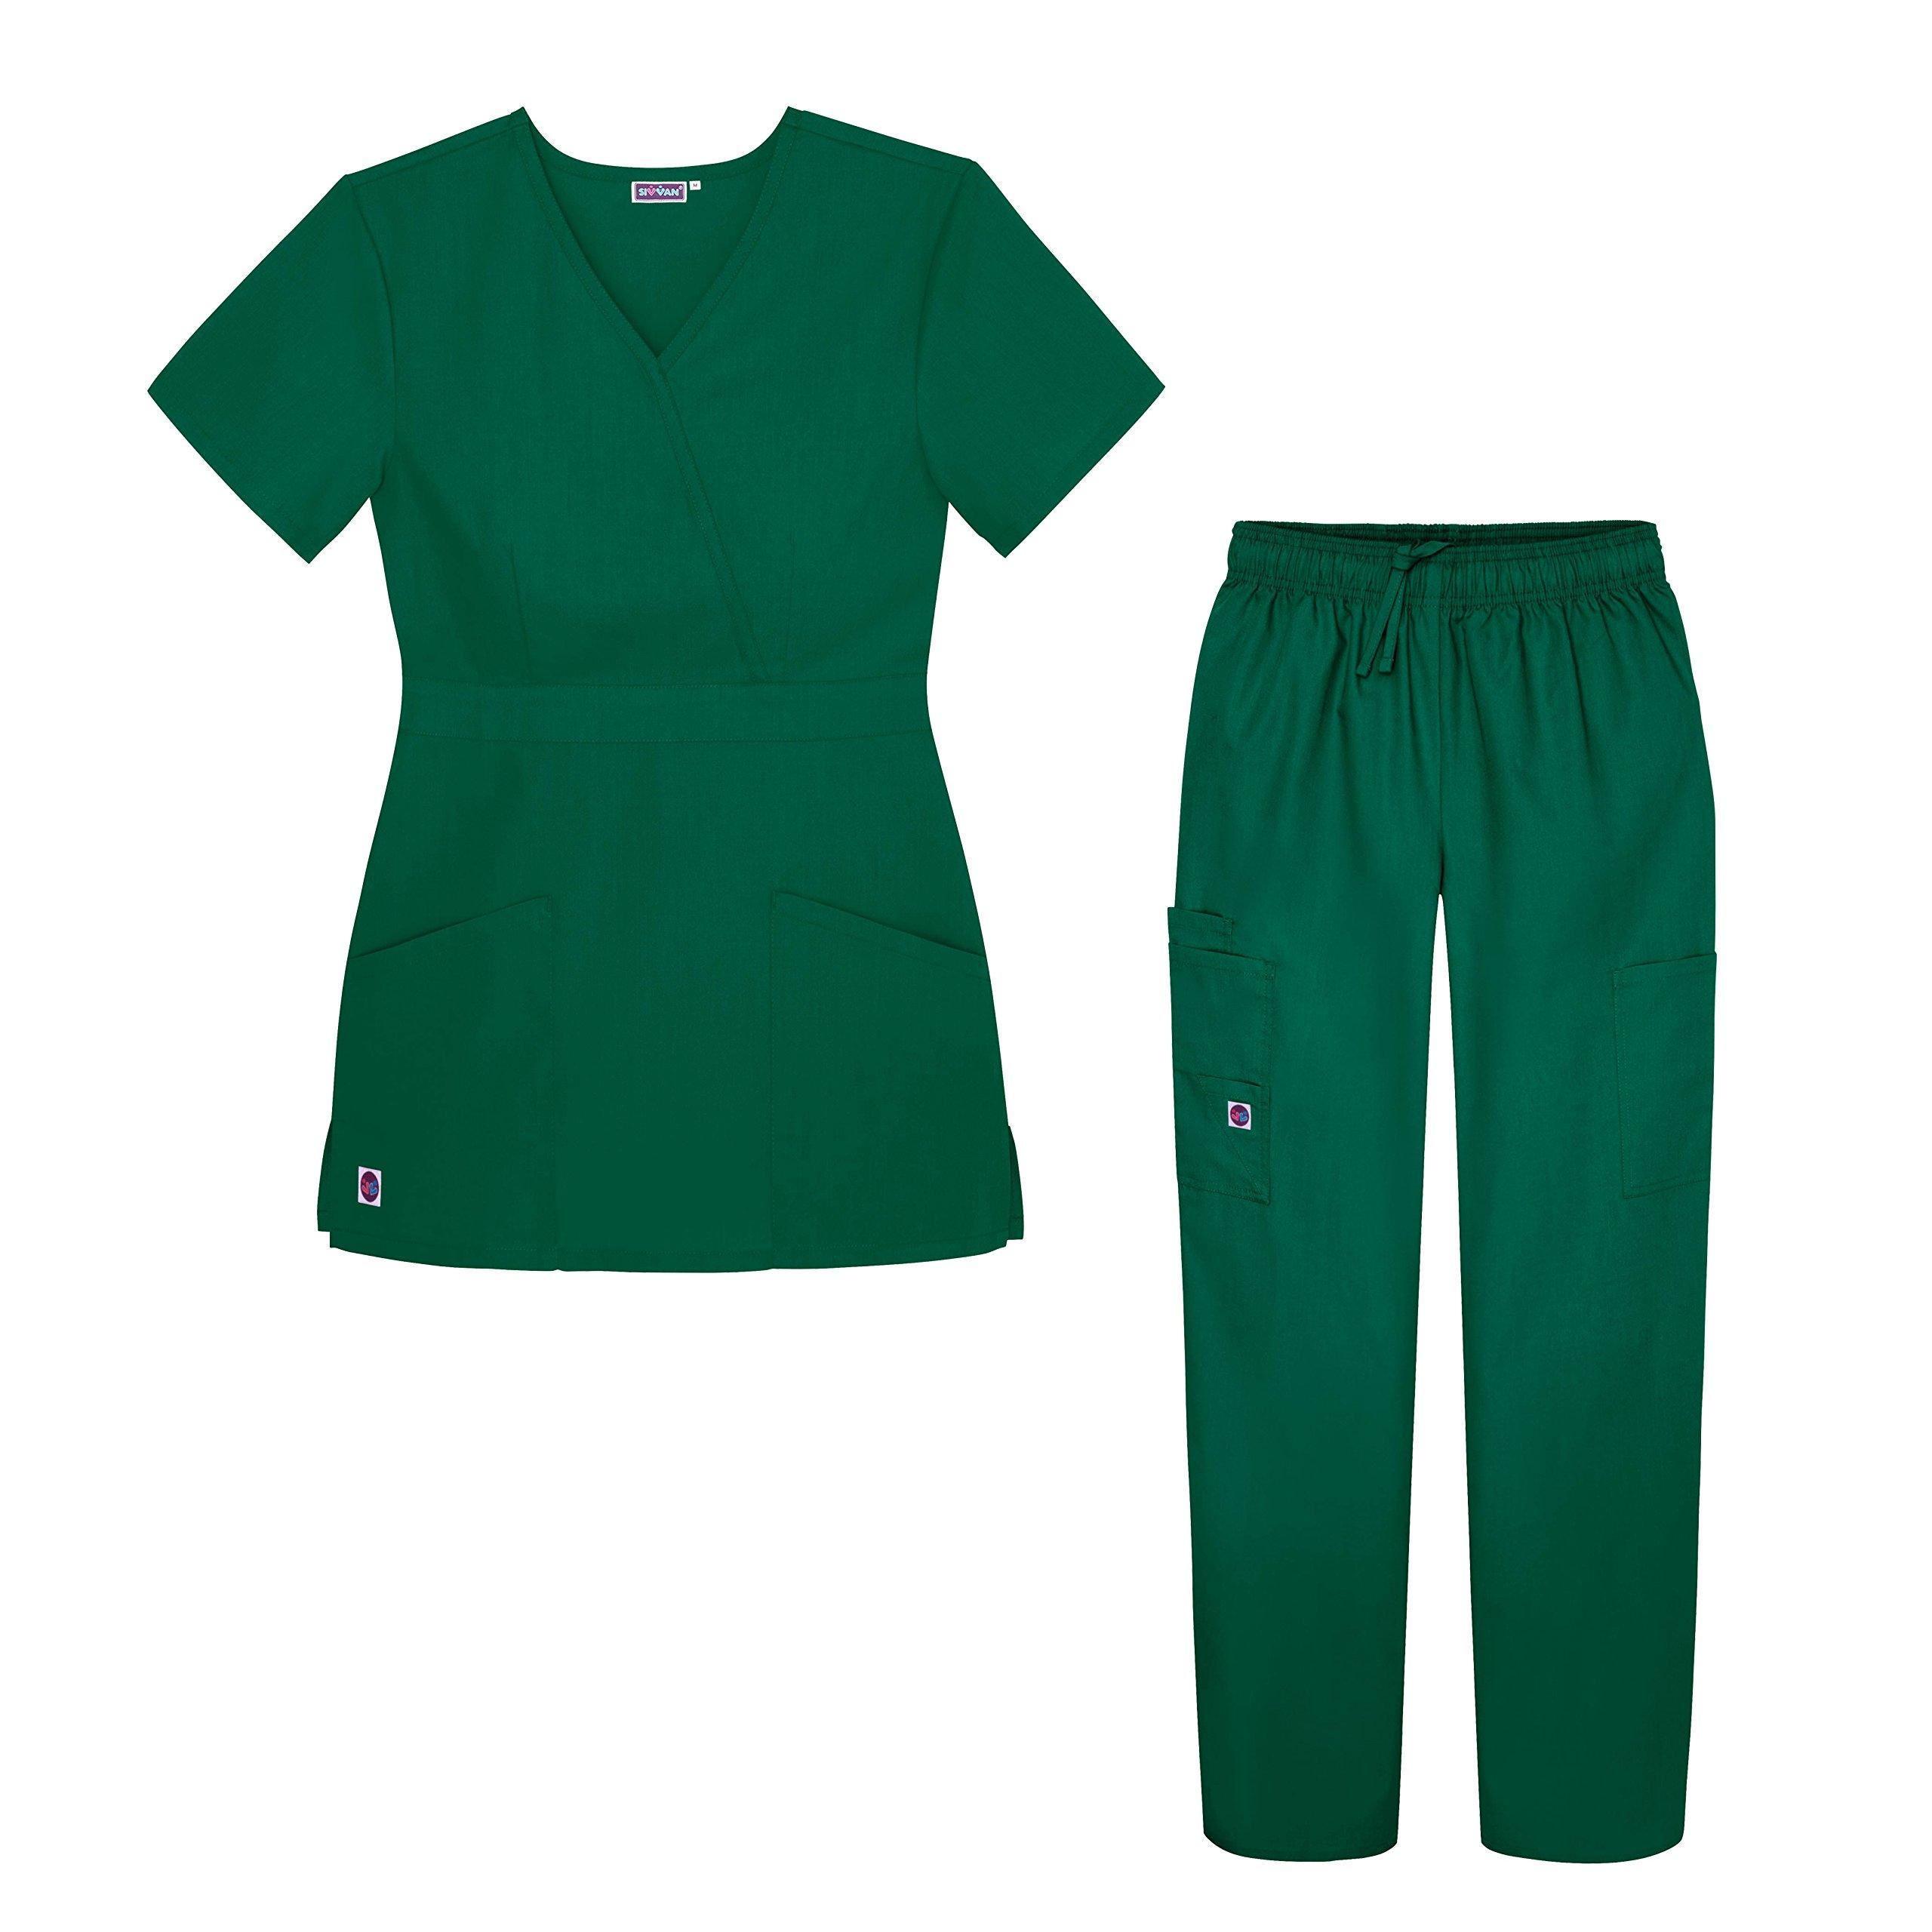 Sivvan Women's Scrub Set - Multi Pocket Cargo Pants & Stylish Mock Wrap Top - S8401 - HGR - M